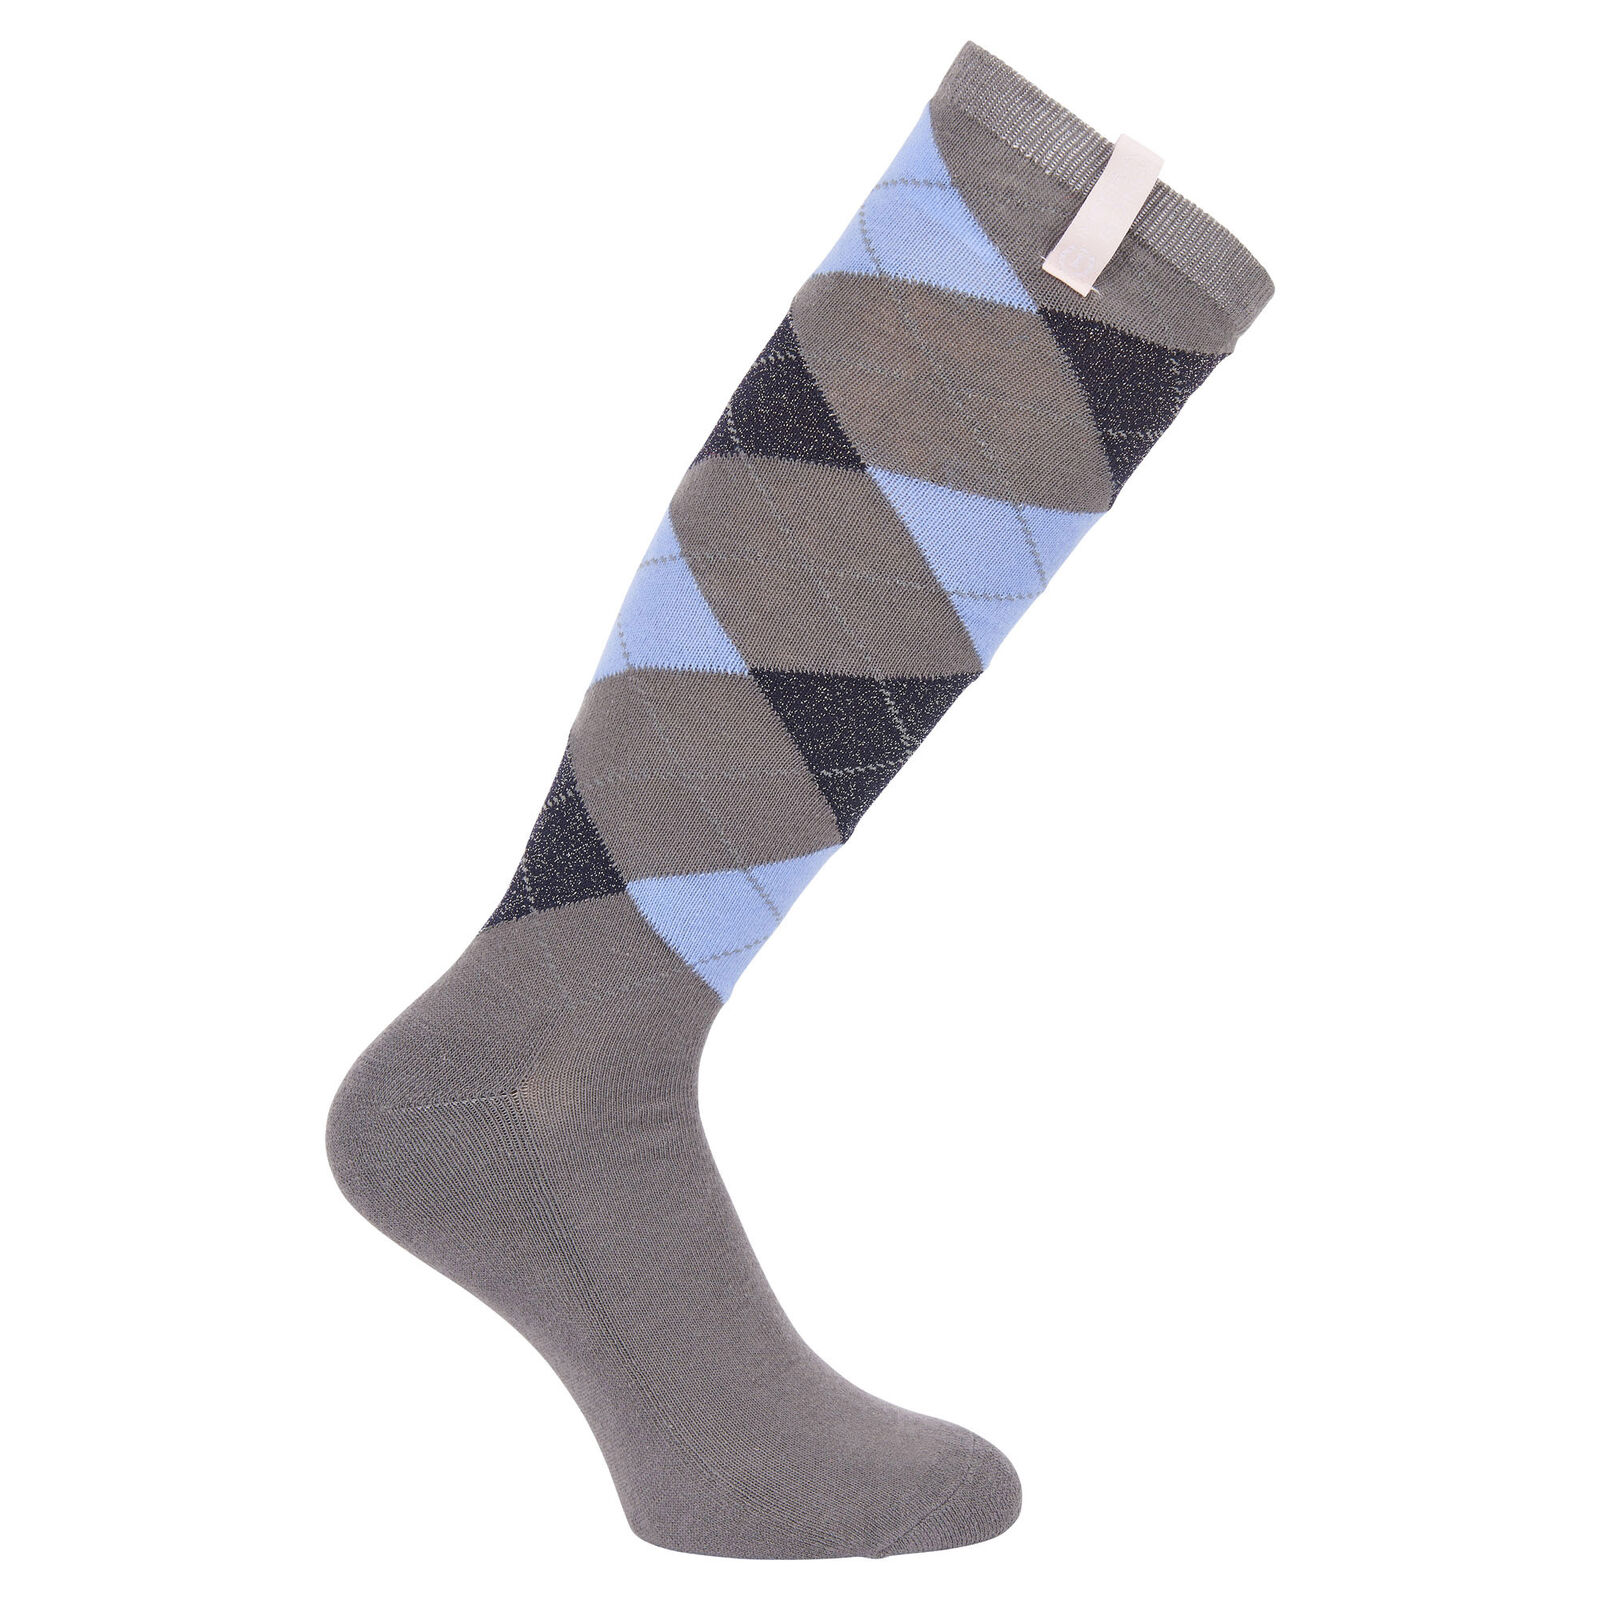 Hope Riding Socks